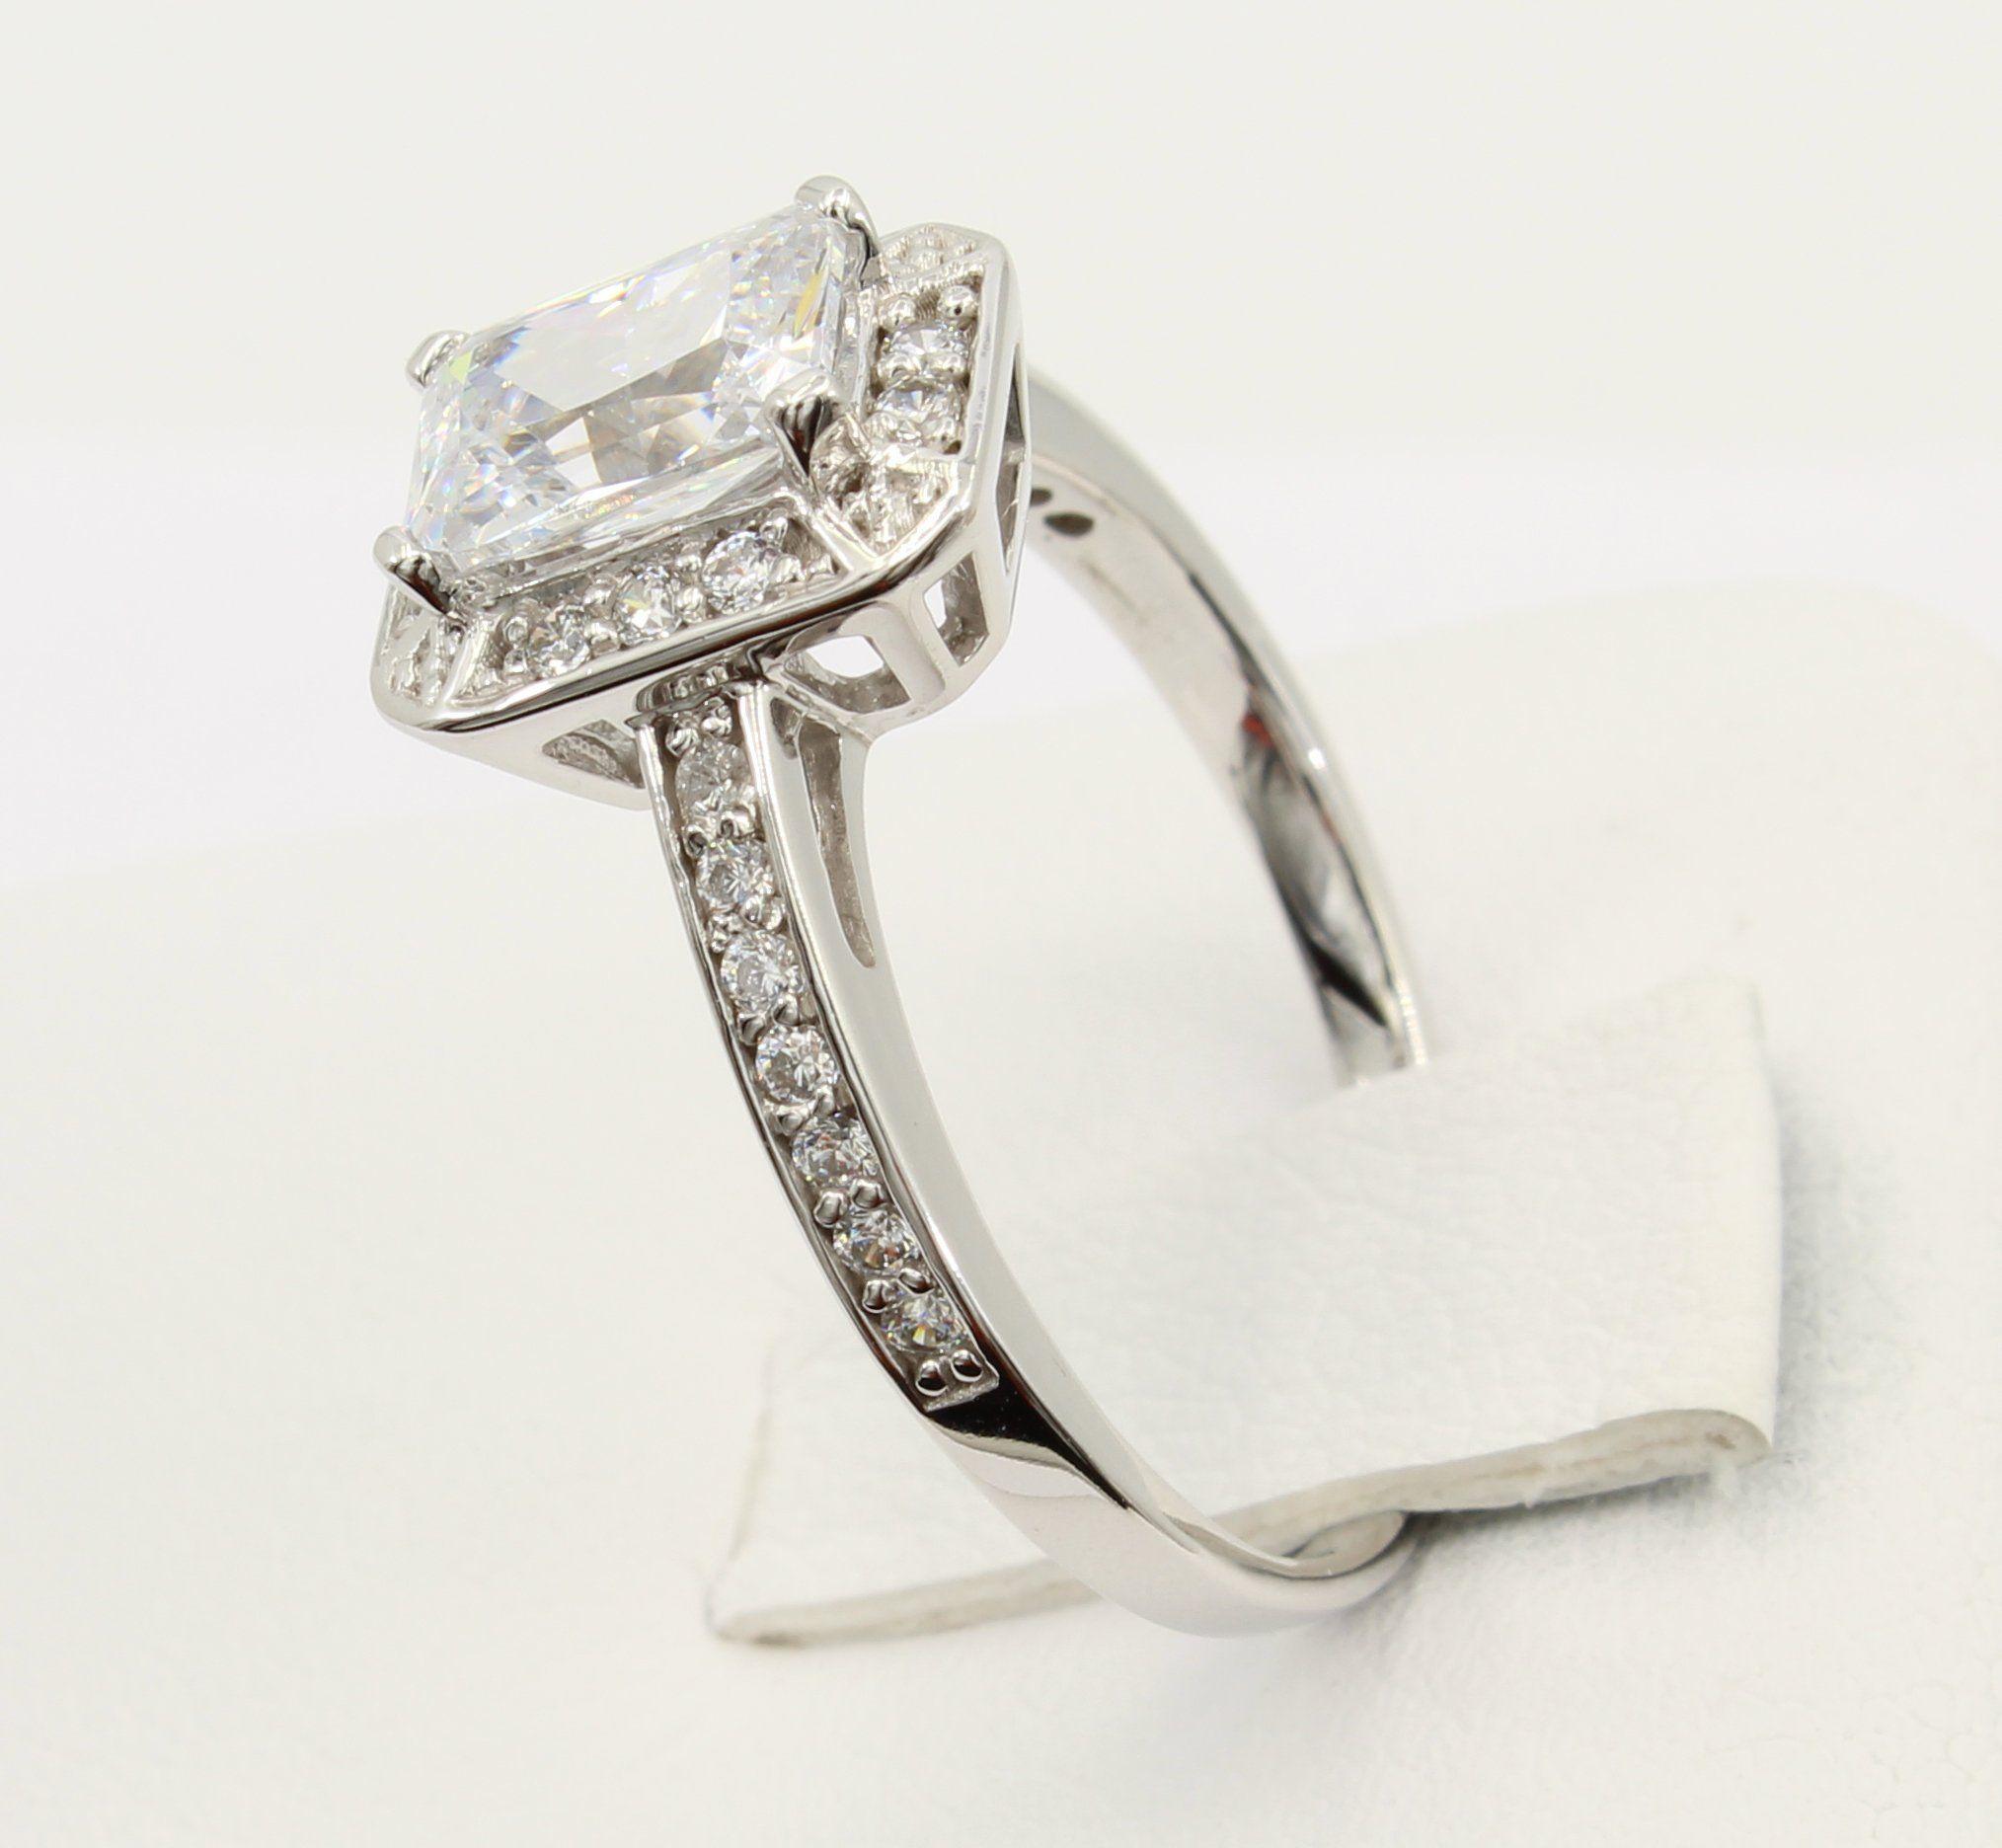 1.50 Ct 14K White Gold Emerald Cut Halo Engagement Wedding Propose Promise Ring